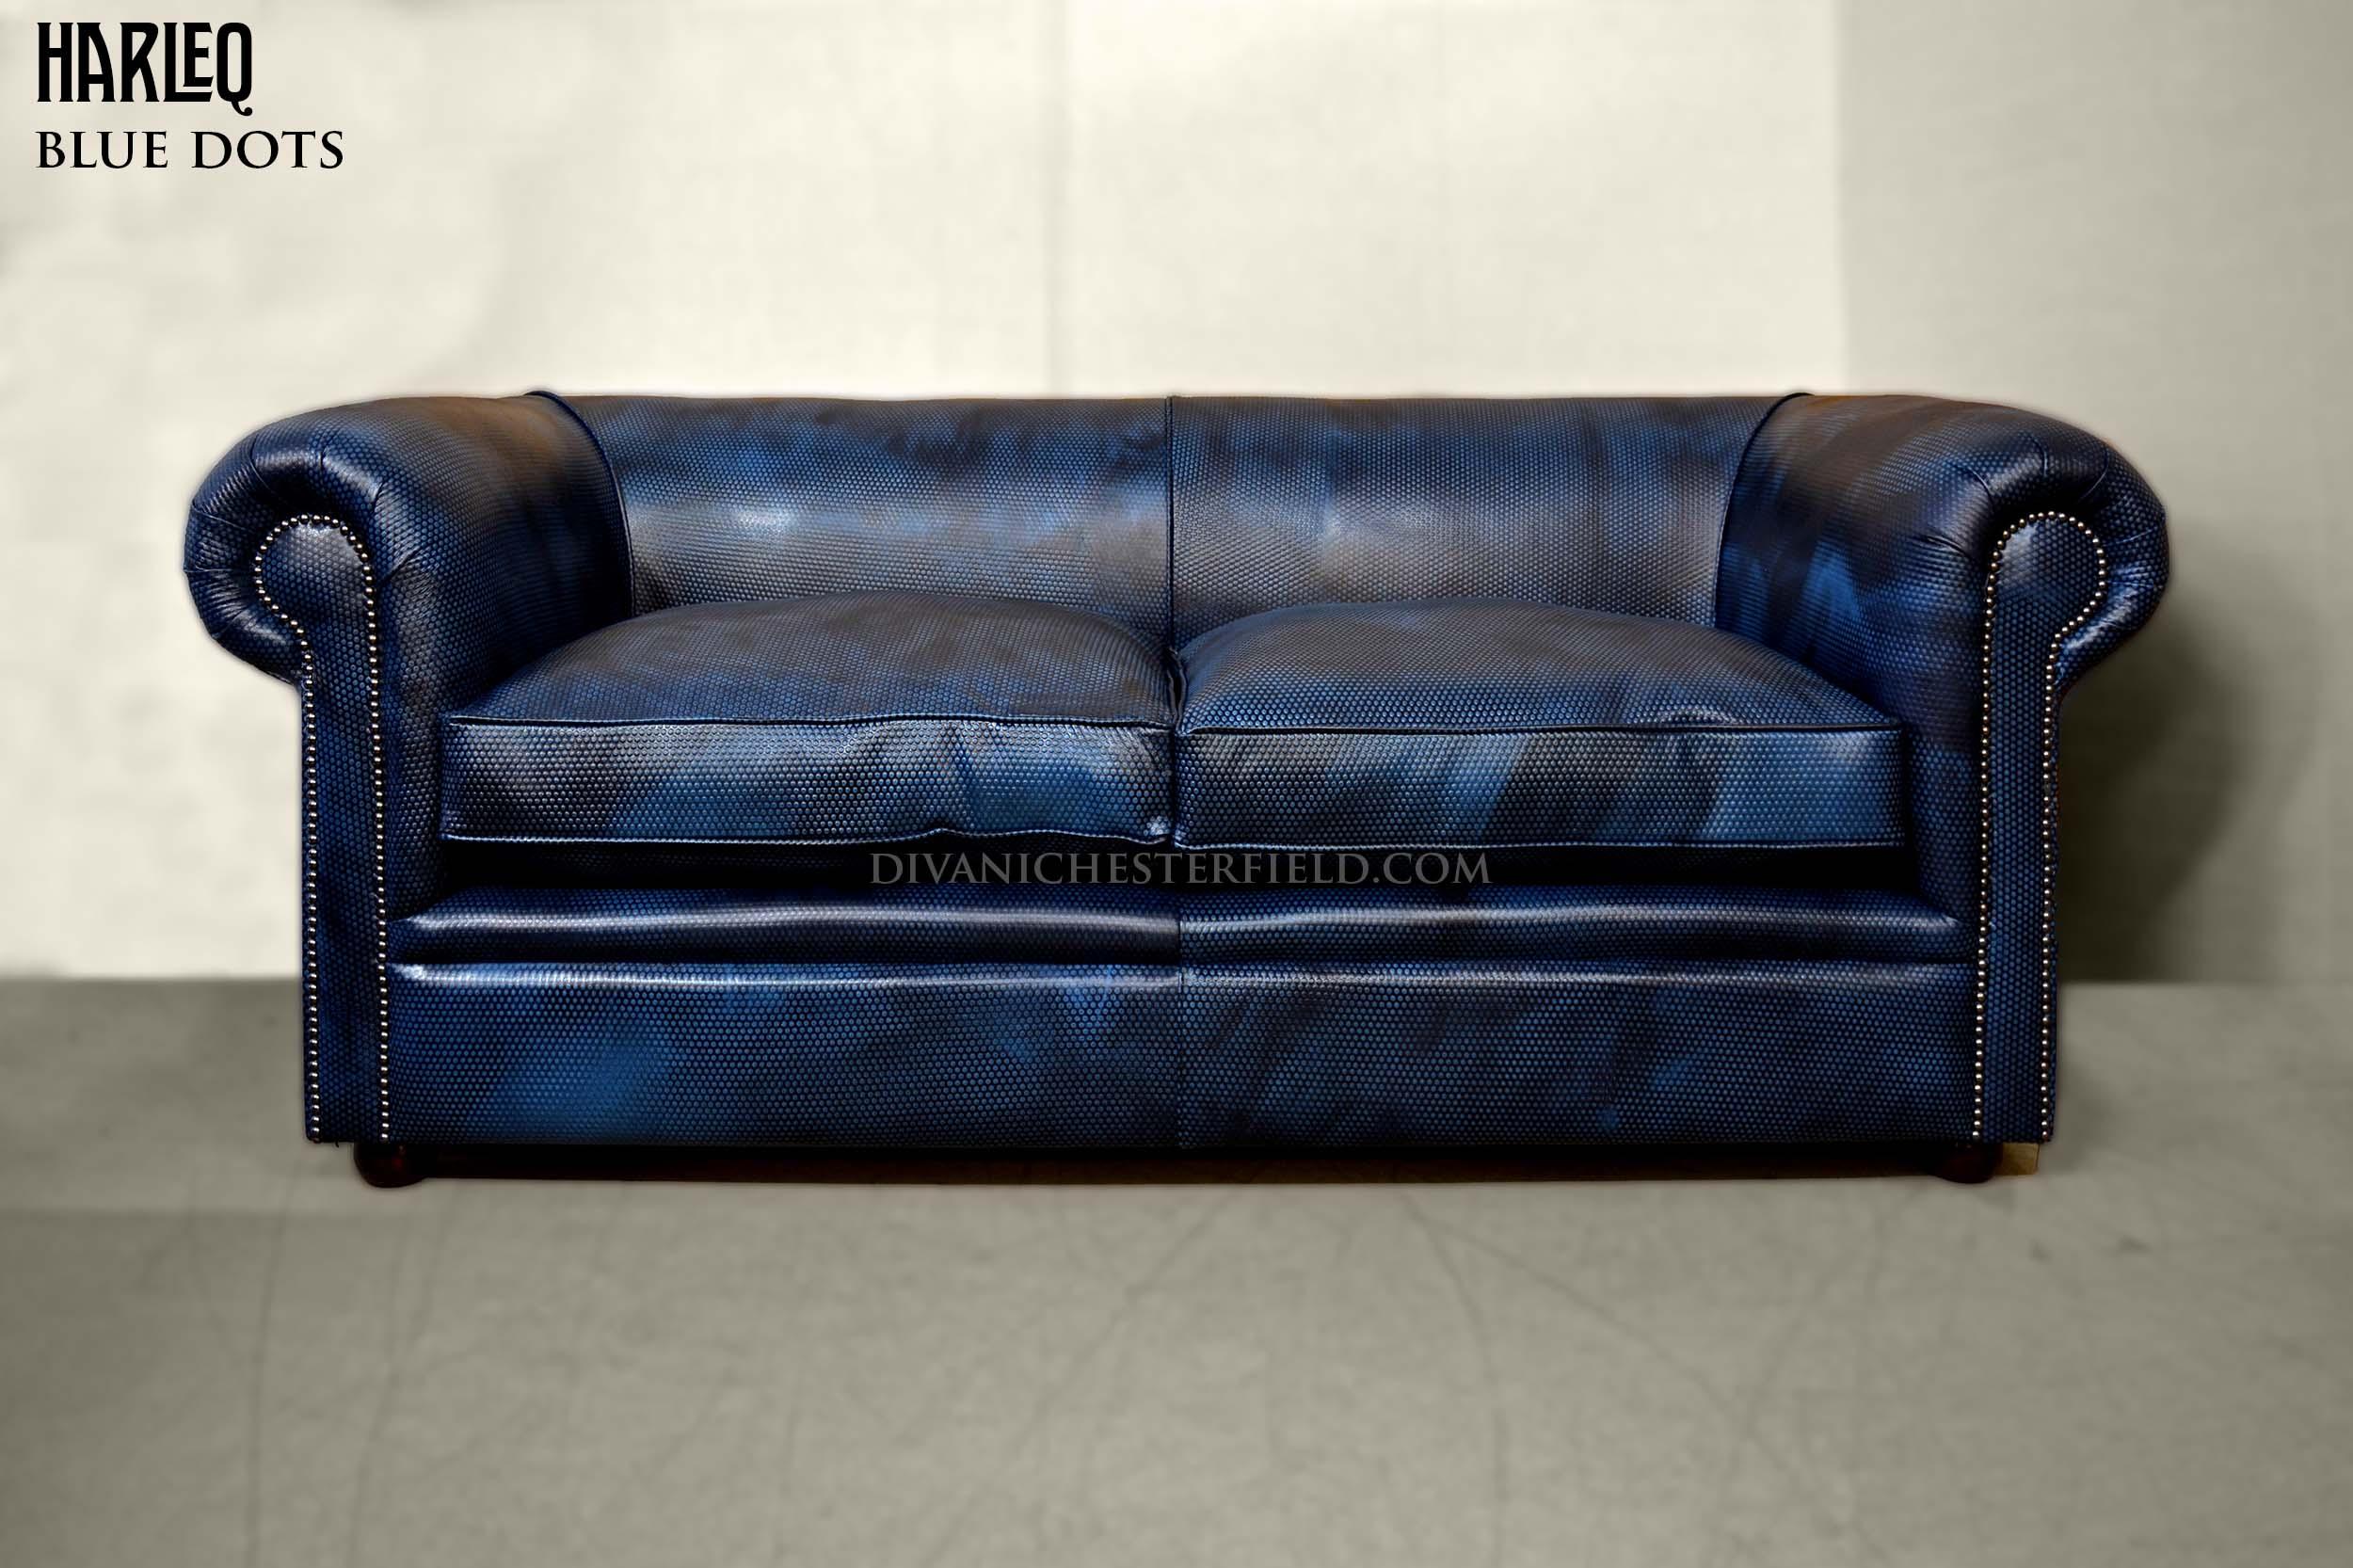 chesterfield-moderno-pelle-blu-design-pois